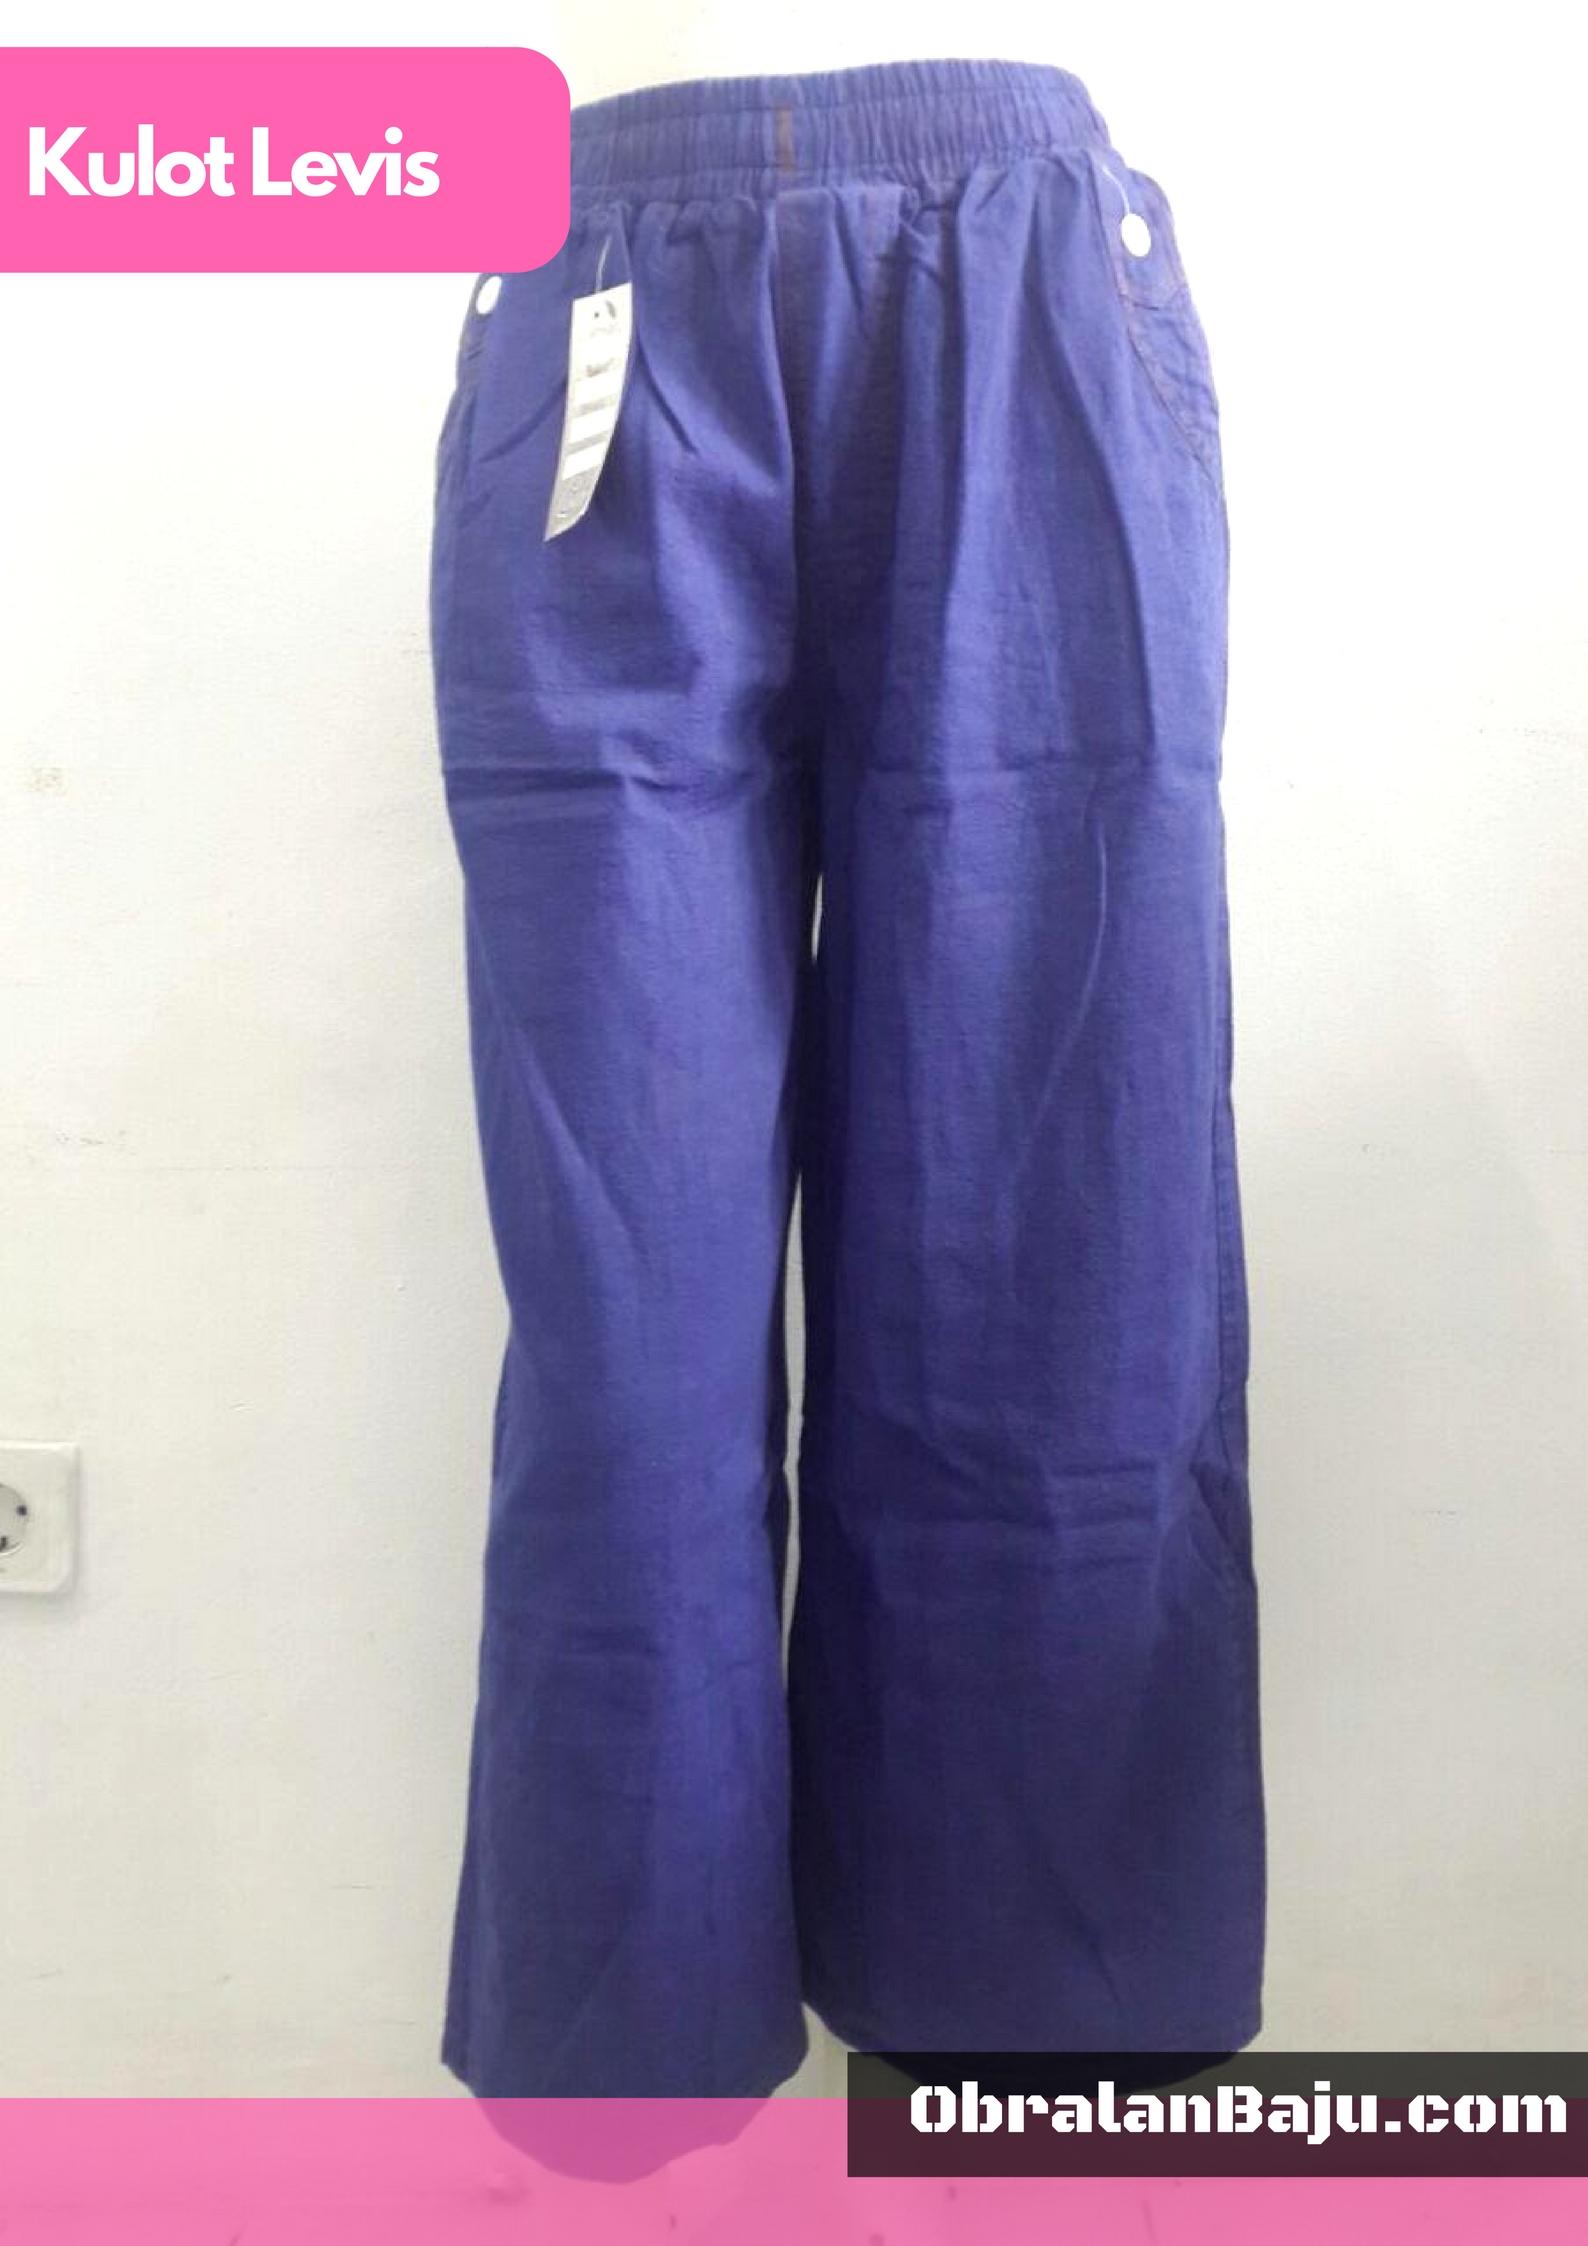 ObralanBaju.com Obral Baju Pakaian Murah Meriah 5000 Celana Kulot Levis